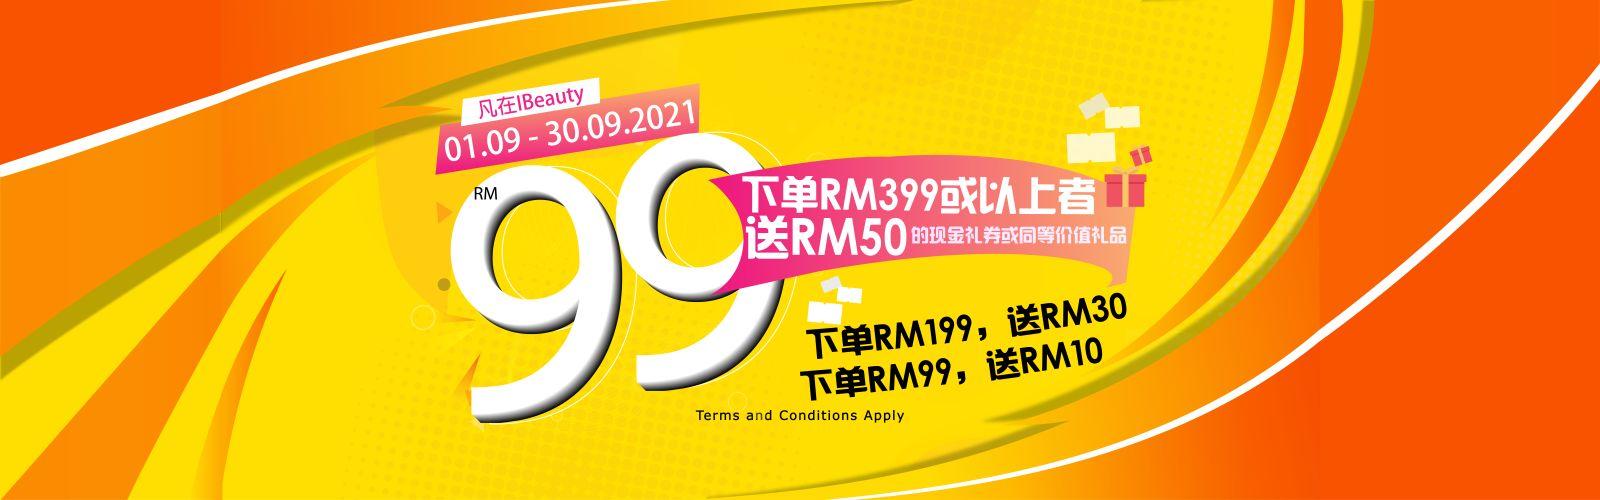 I-Beauty Special Sponsored 9.9 Rebate Event